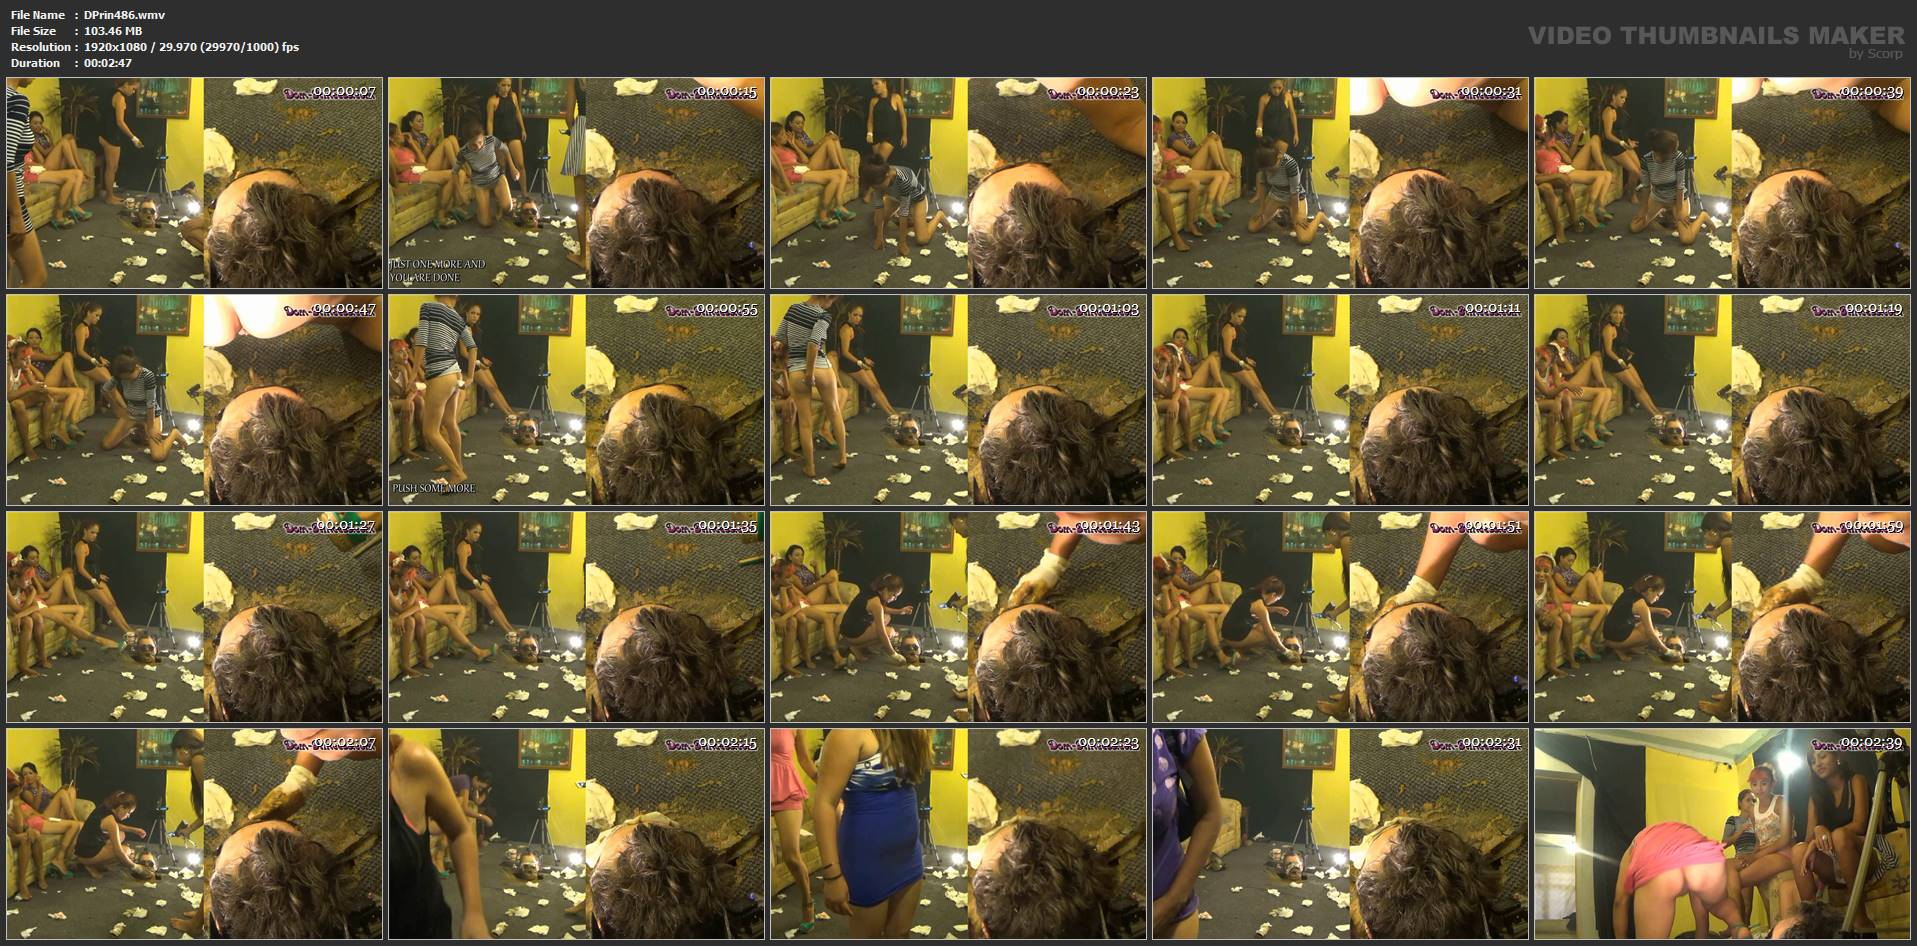 [DOM-PRINCESS] Under Floor Tube Biter Part 7 Susan [FULL HD][1080p][WMV]